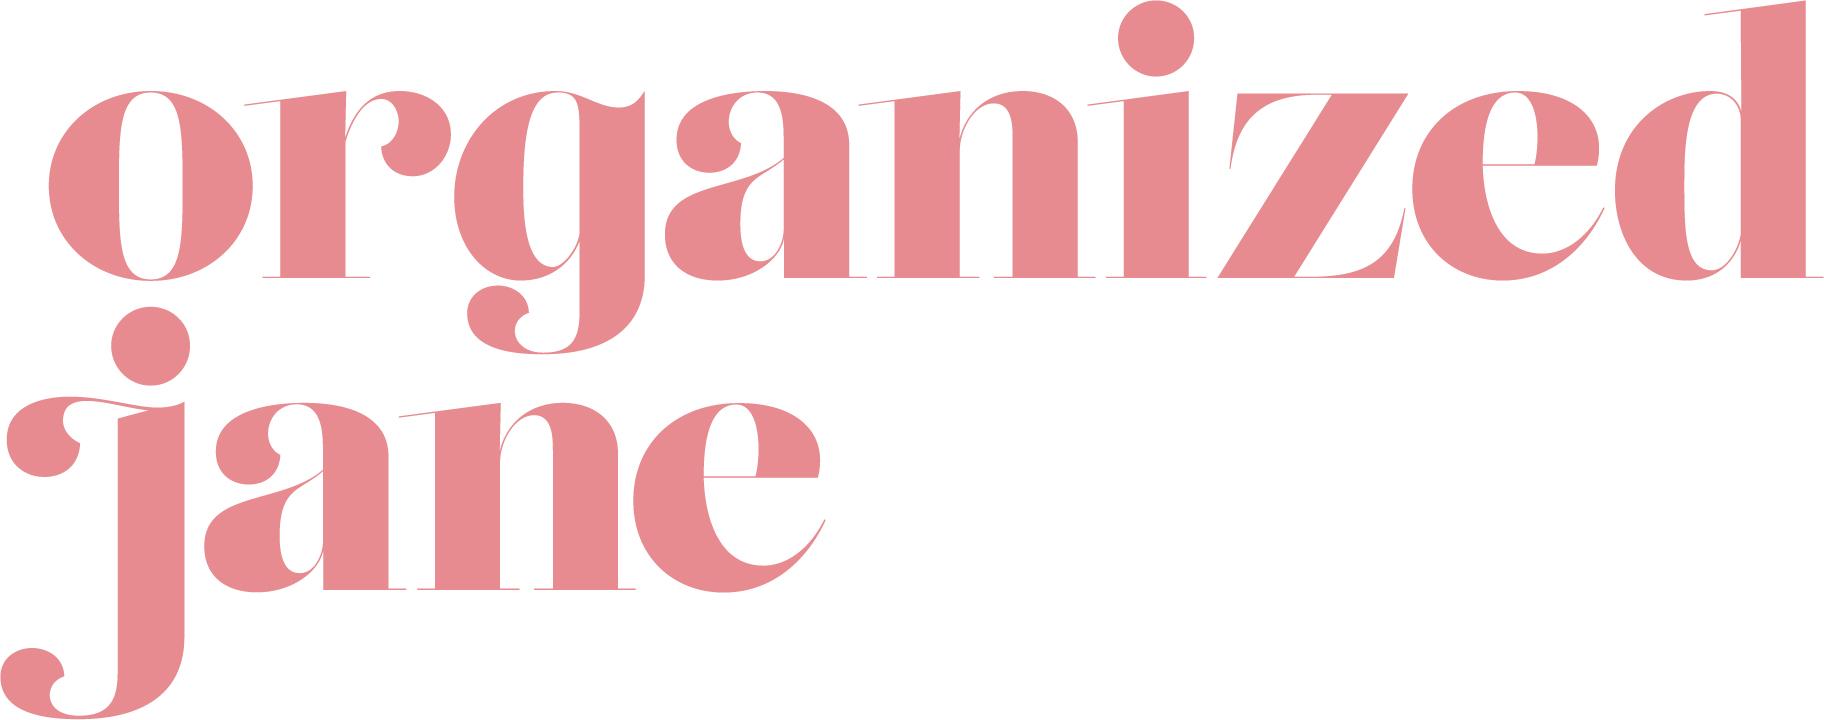 Organized Jane Coaching